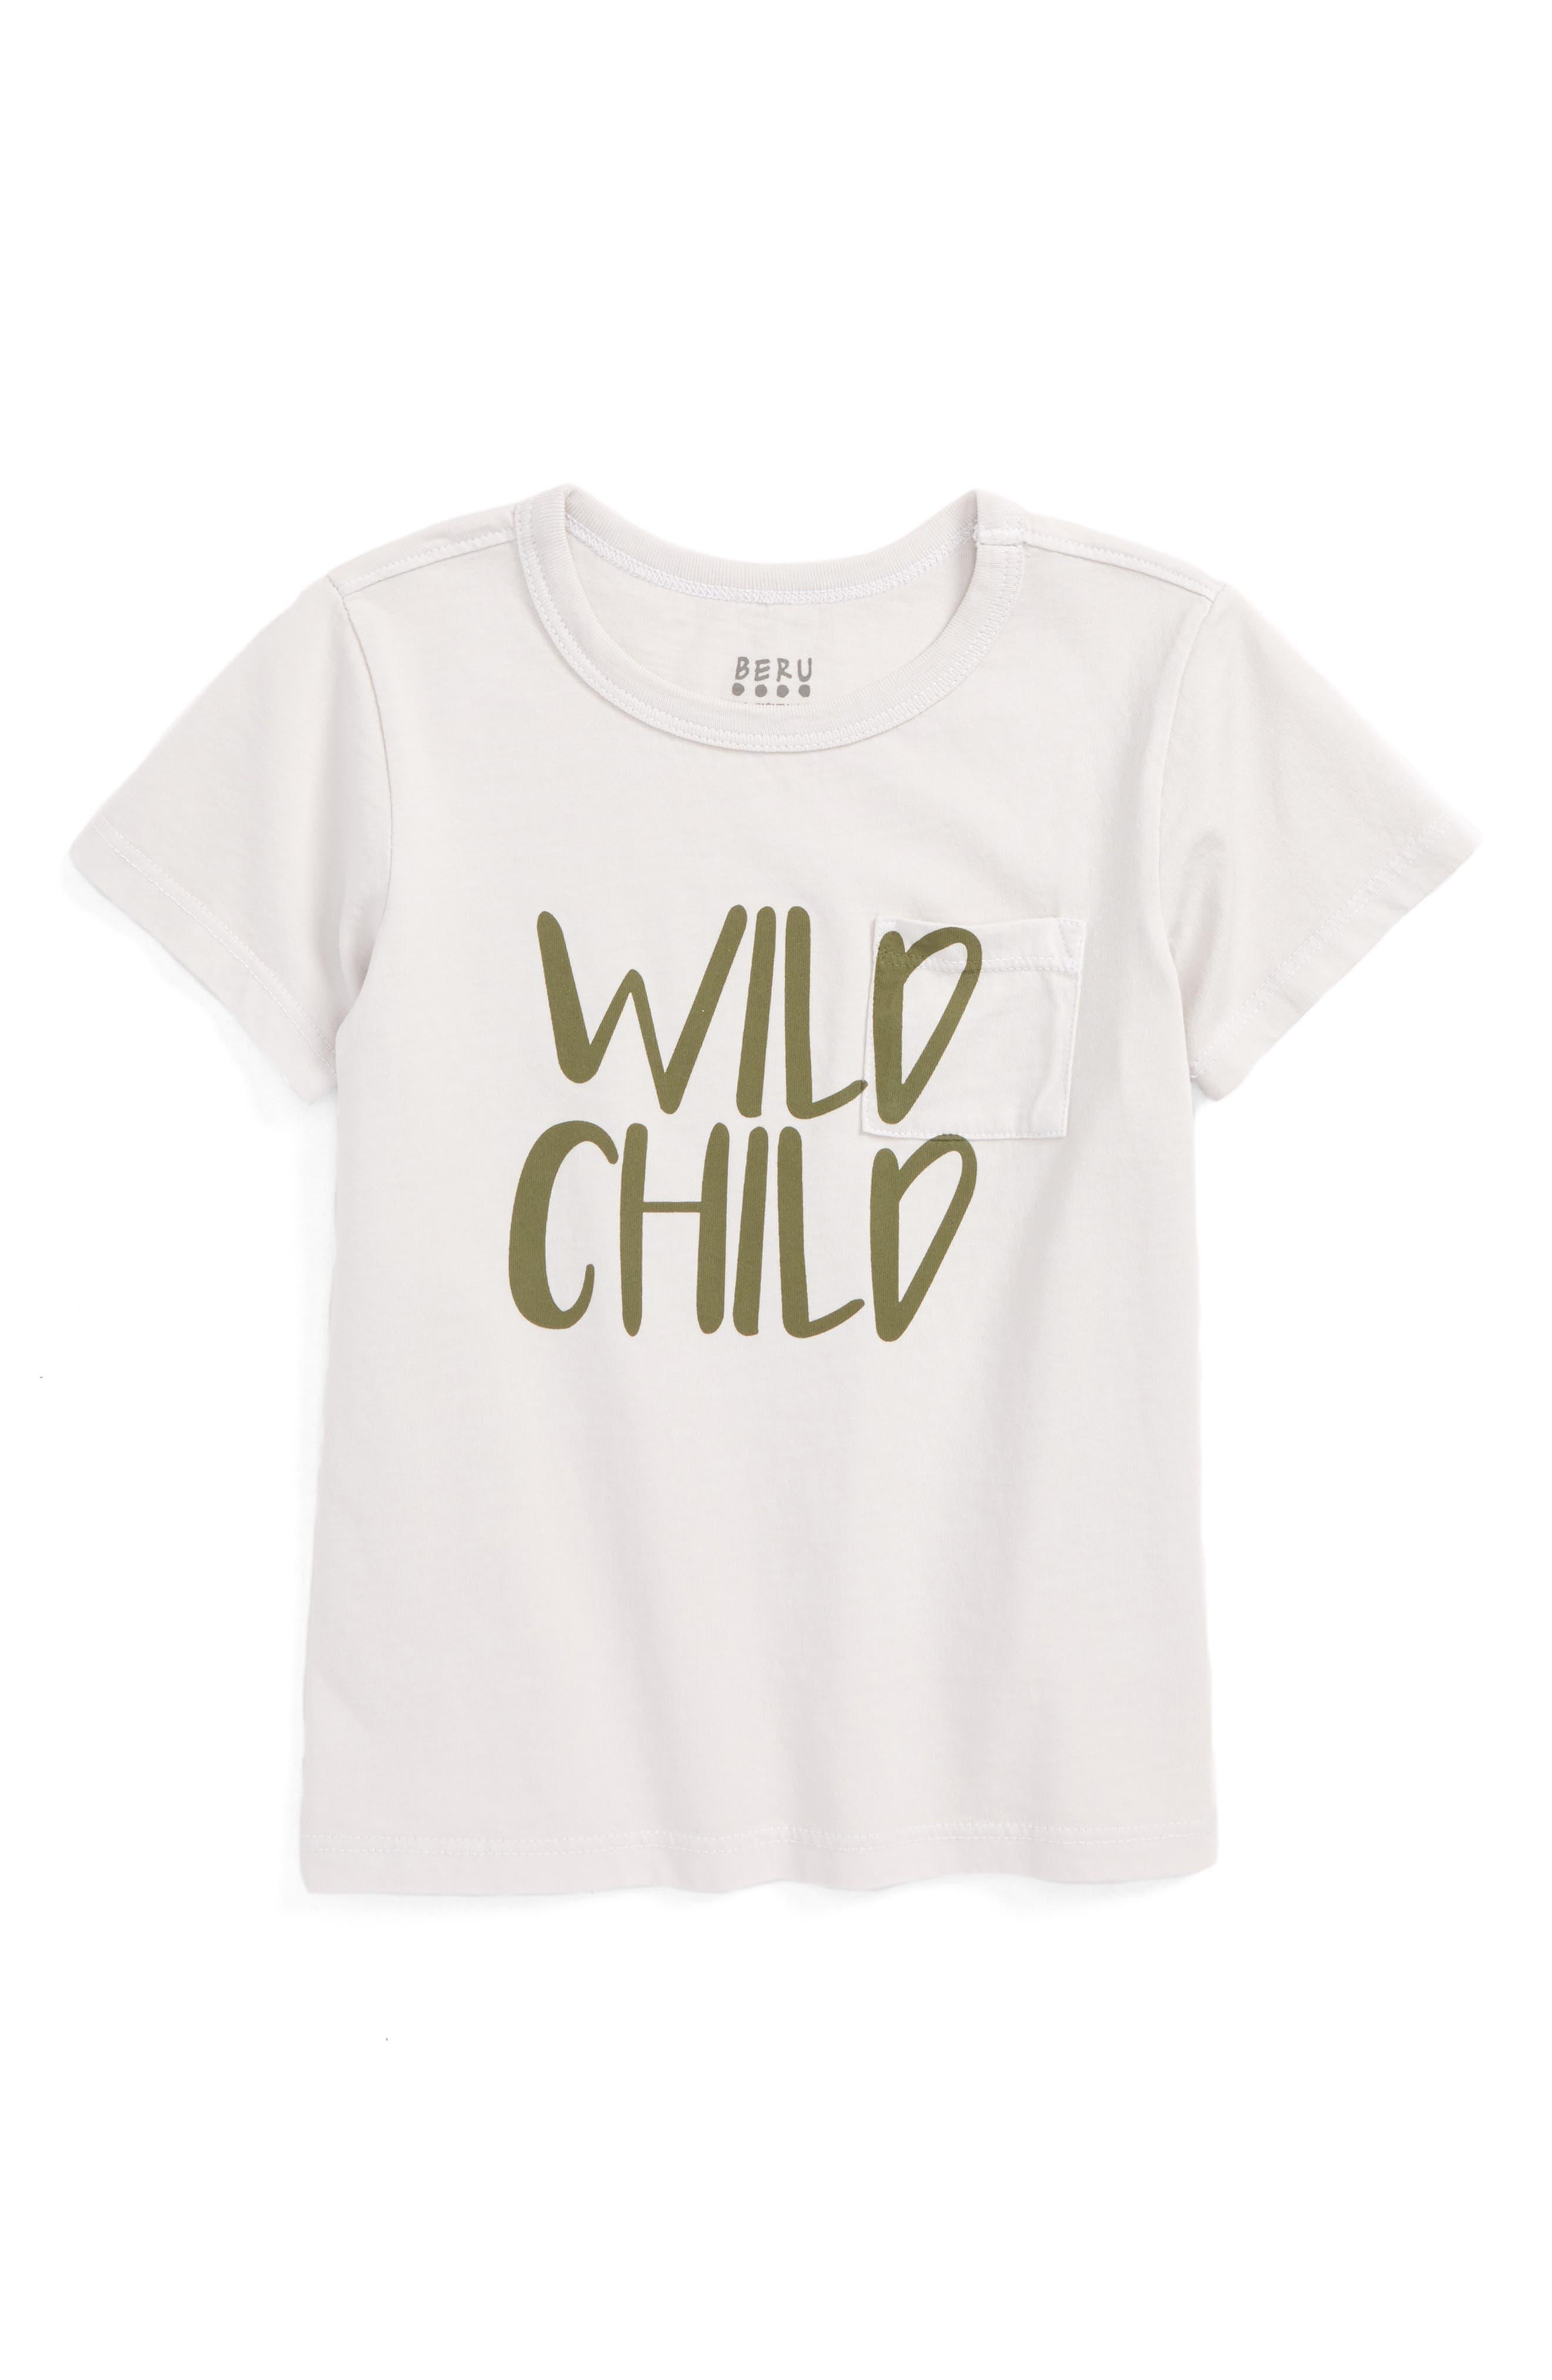 Huxley - Wild Child Organic Cotton T-Shirt,                         Main,                         color, 250